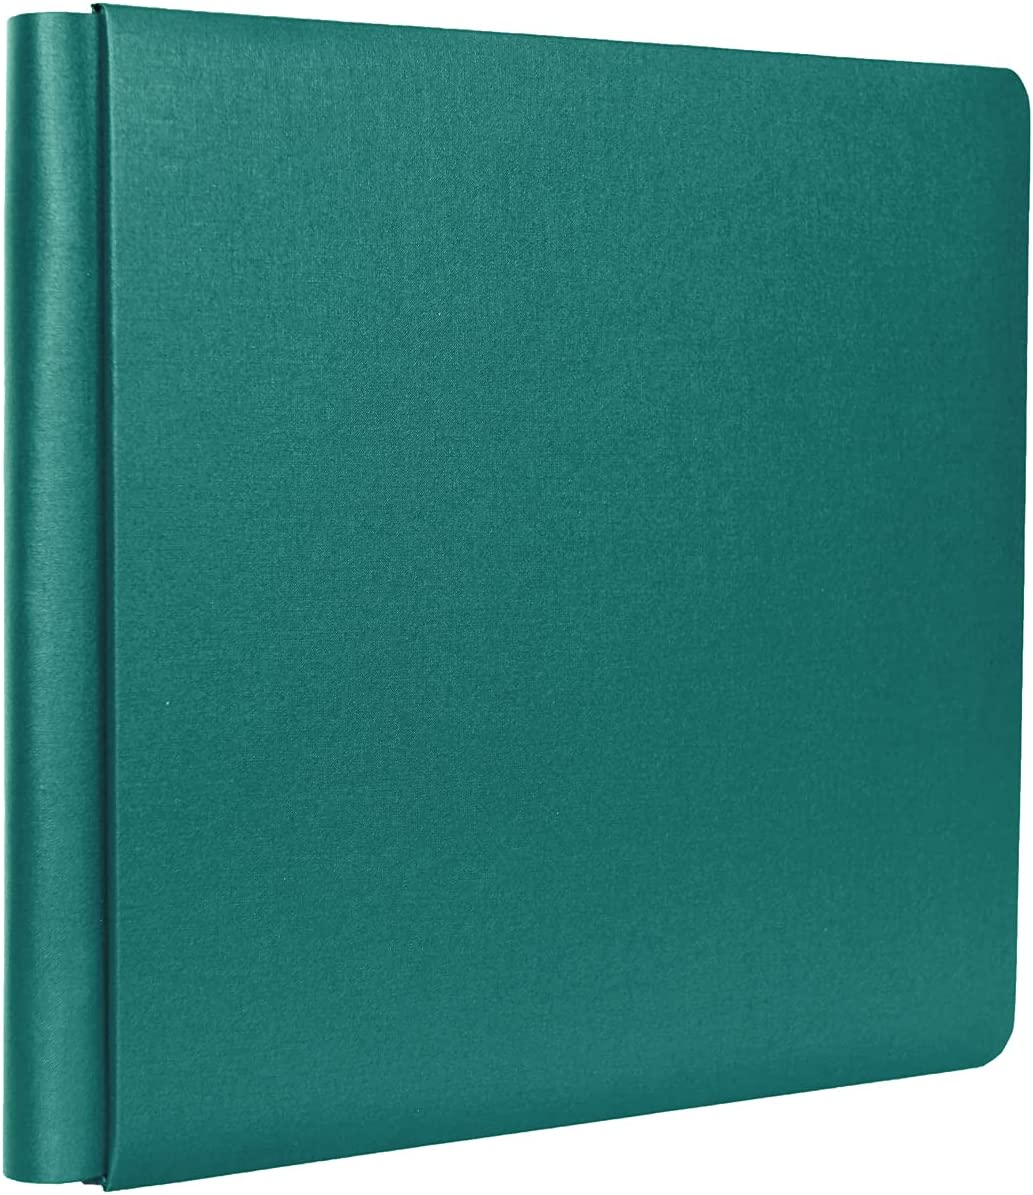 Cheap SALE Start 12x12 Hunter Green Album by mart Cover Memories Creative